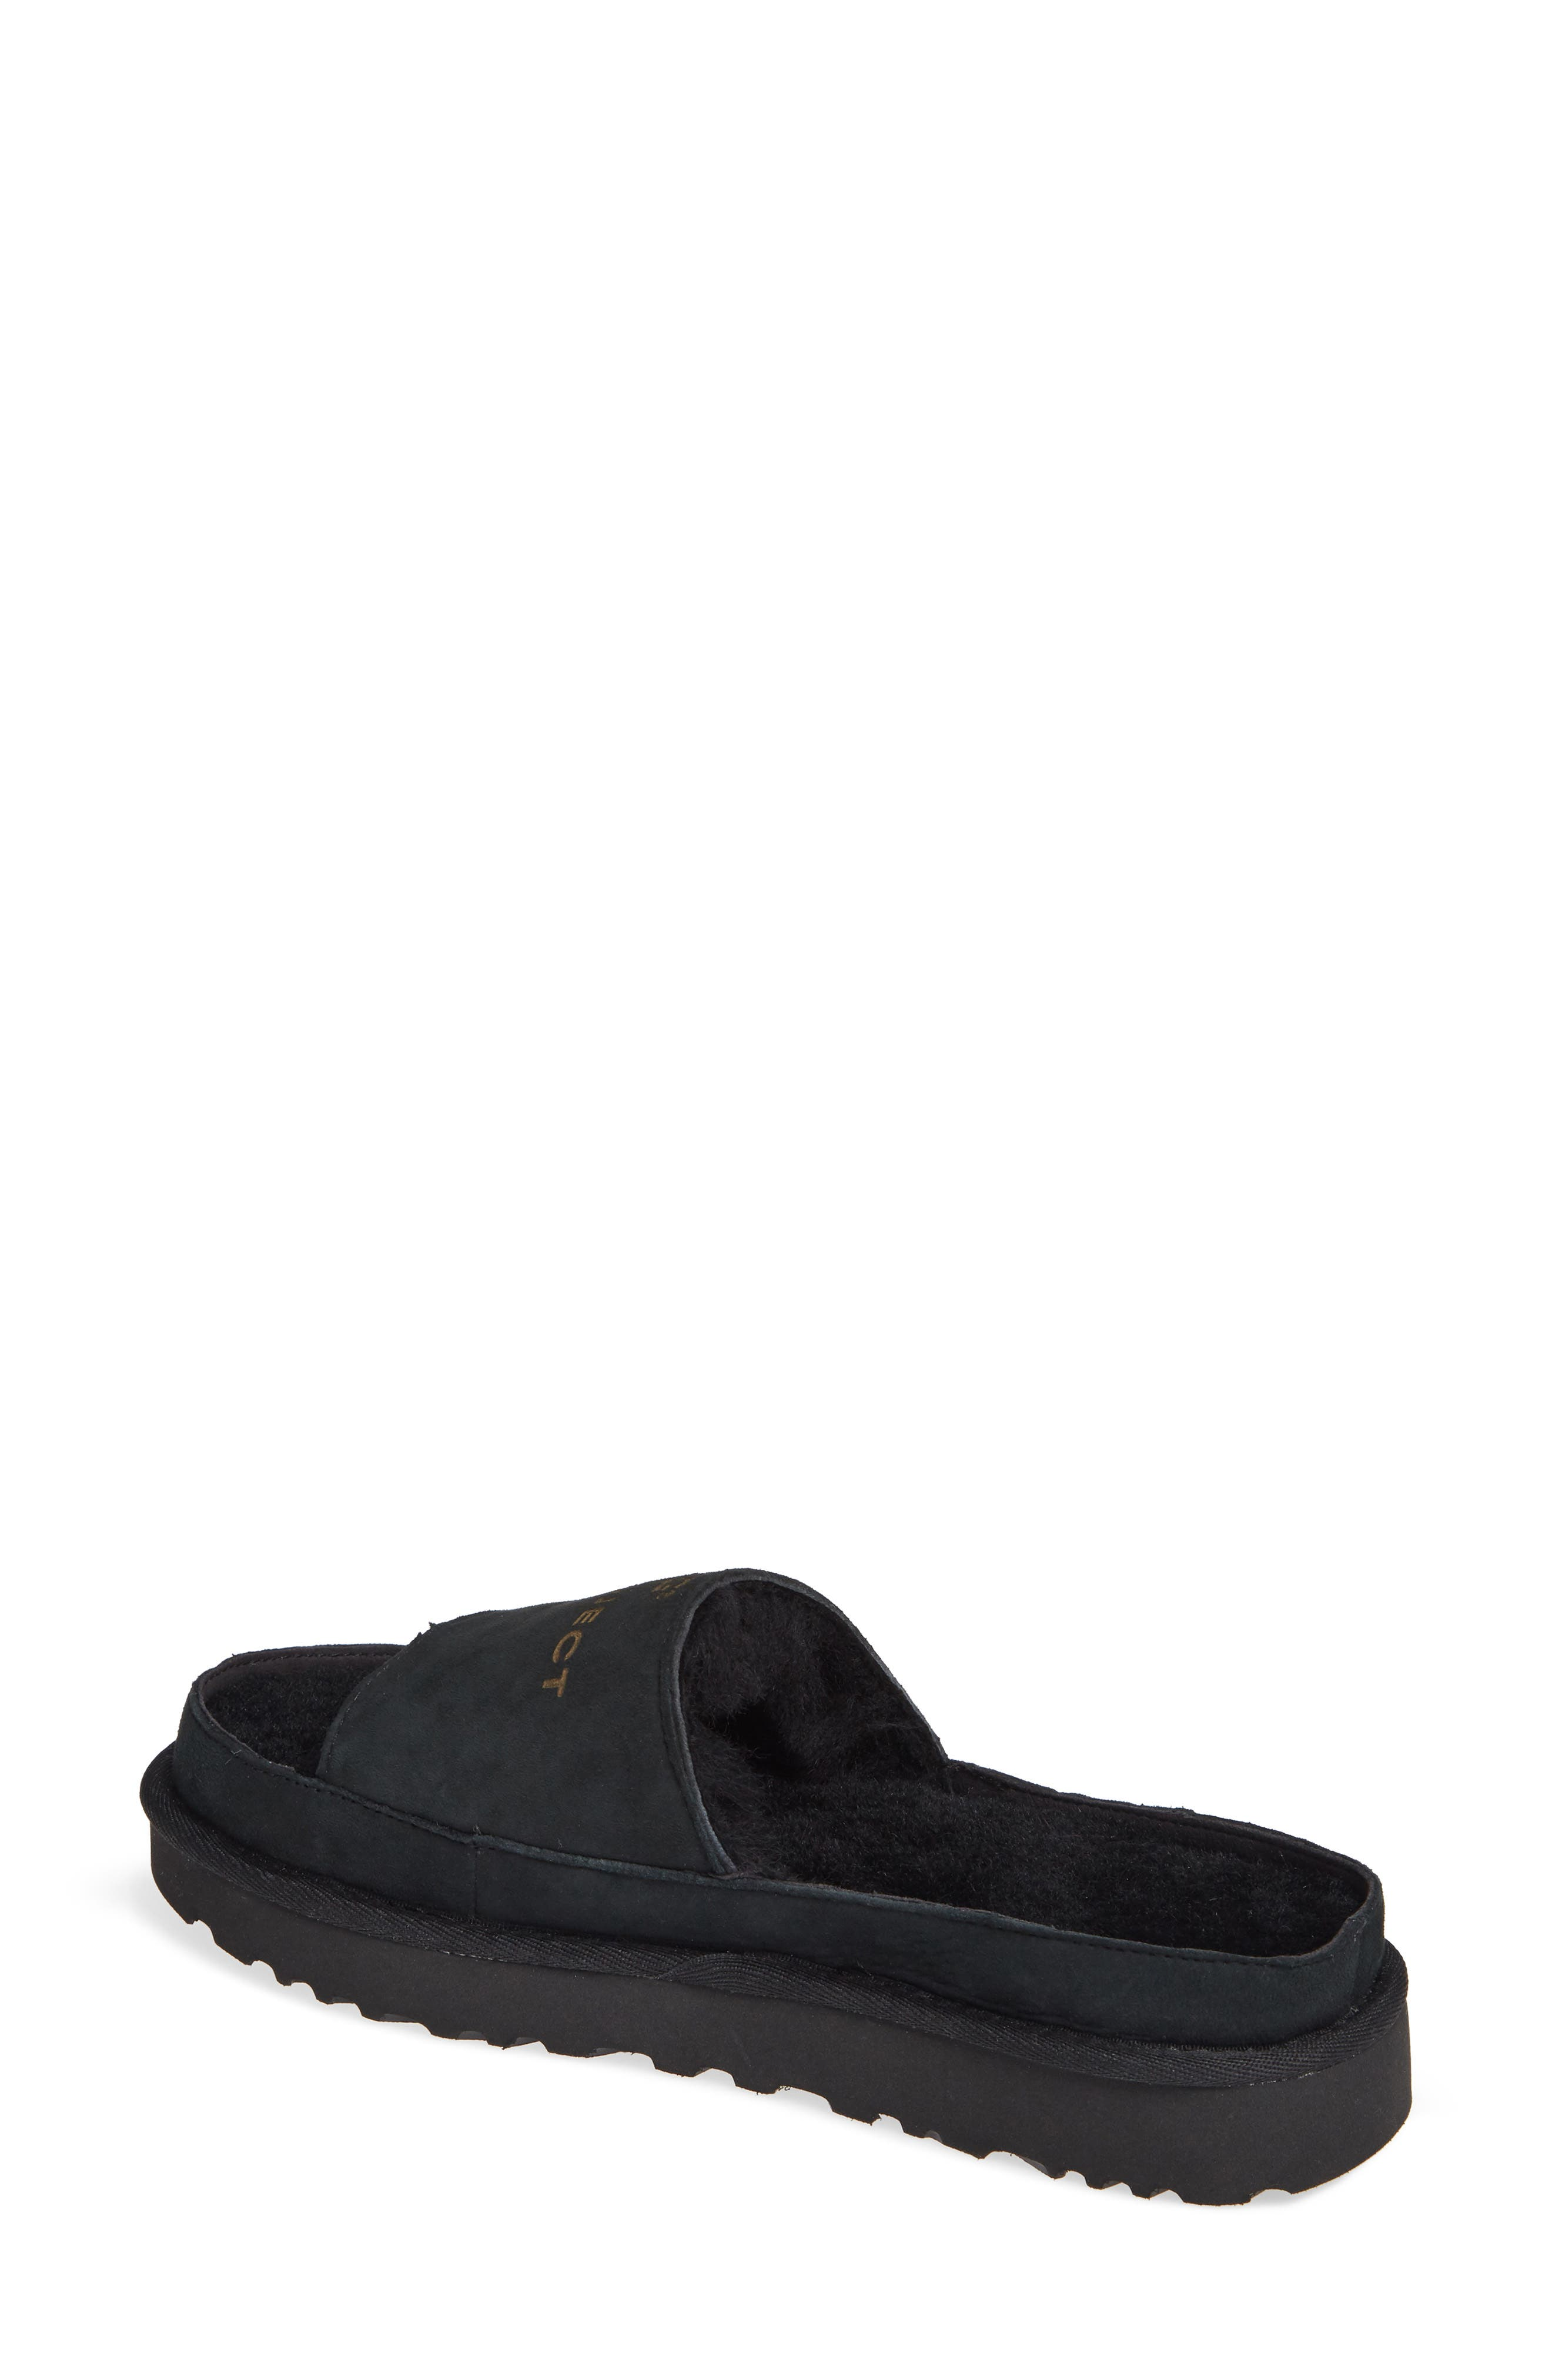 x UGG<sup>®</sup> Genuine Shearling Slide Sandal,                             Alternate thumbnail 2, color,                             001